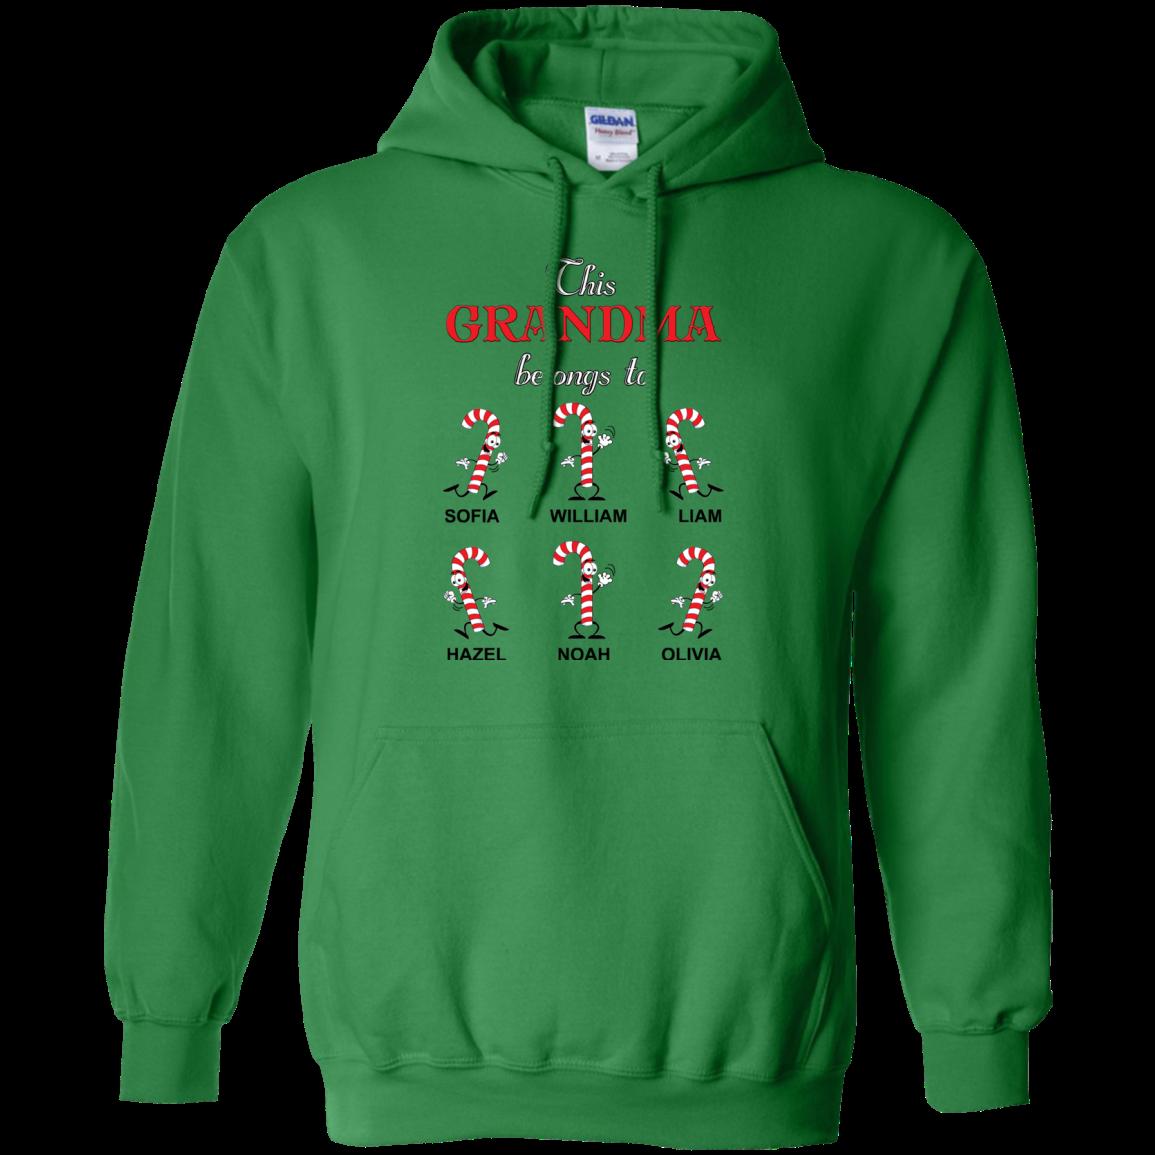 ☃️☃️ Candy canes Sweatshirts/Hoodies ☃️☃️ - Hoodie / Irish Green / 4XL